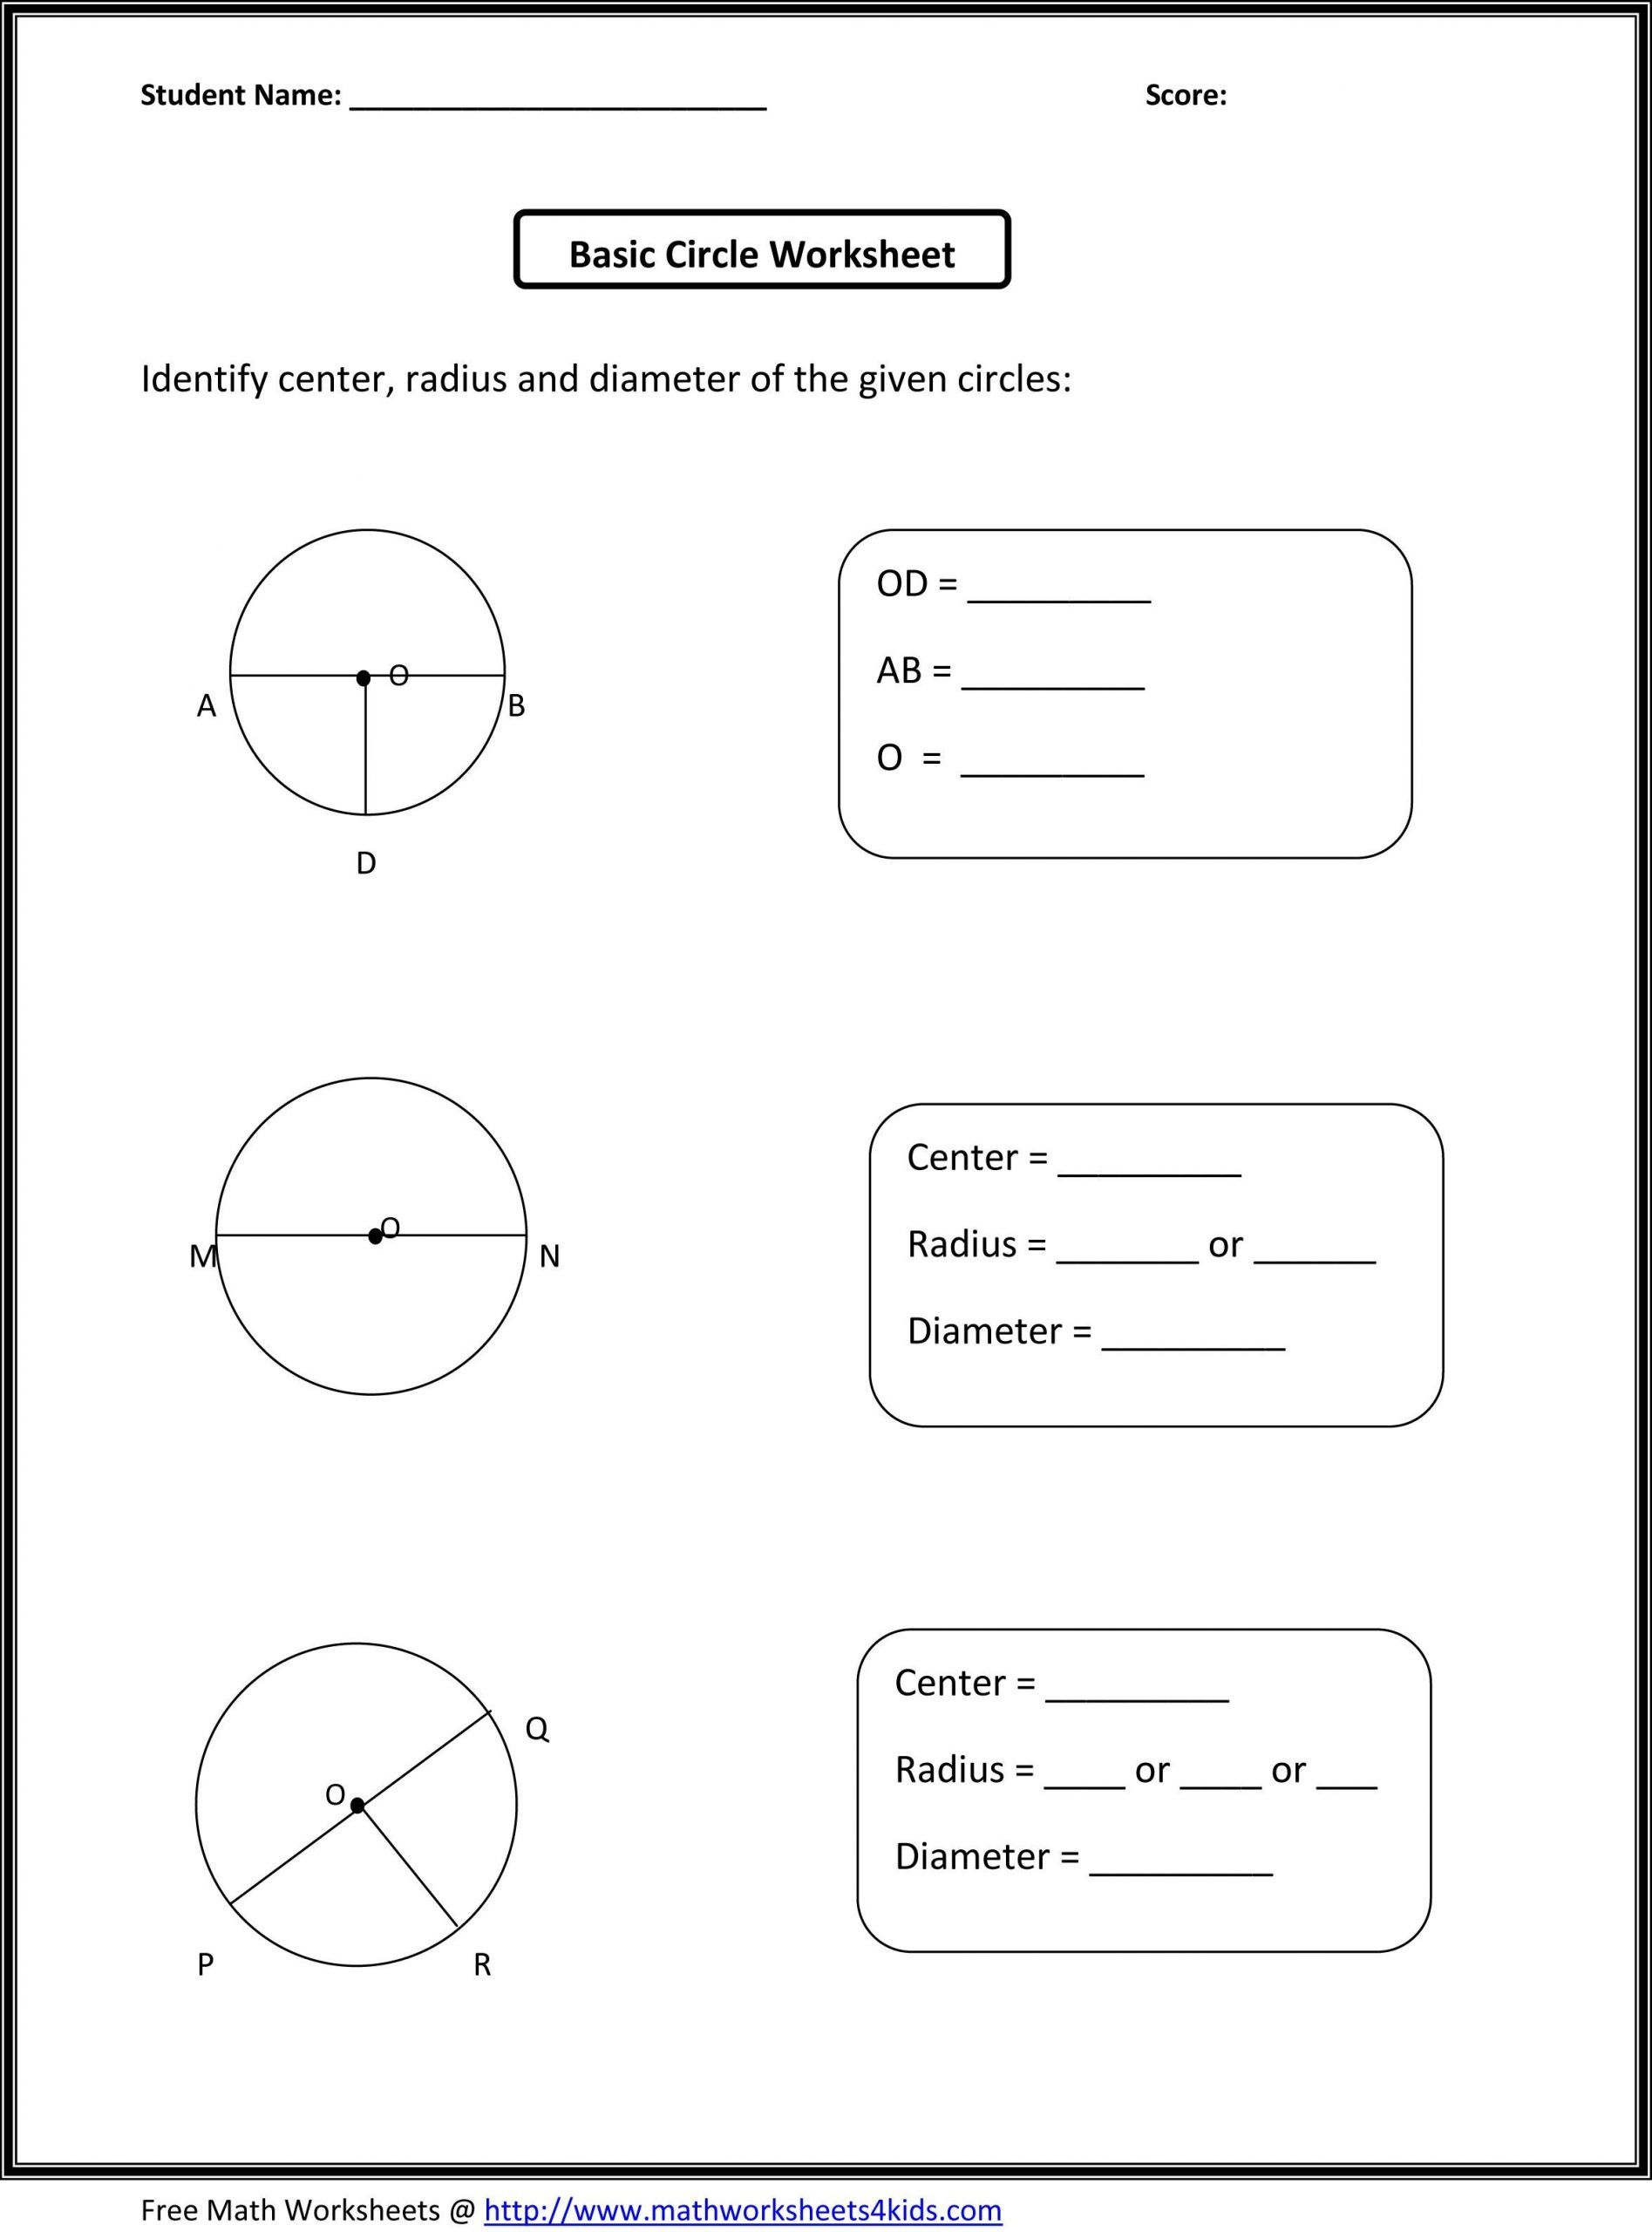 6 General Worksheets 7th Grade Math In 2020 Printable Math Worksheets Free Math Worksheets 3rd Grade Math Worksheets